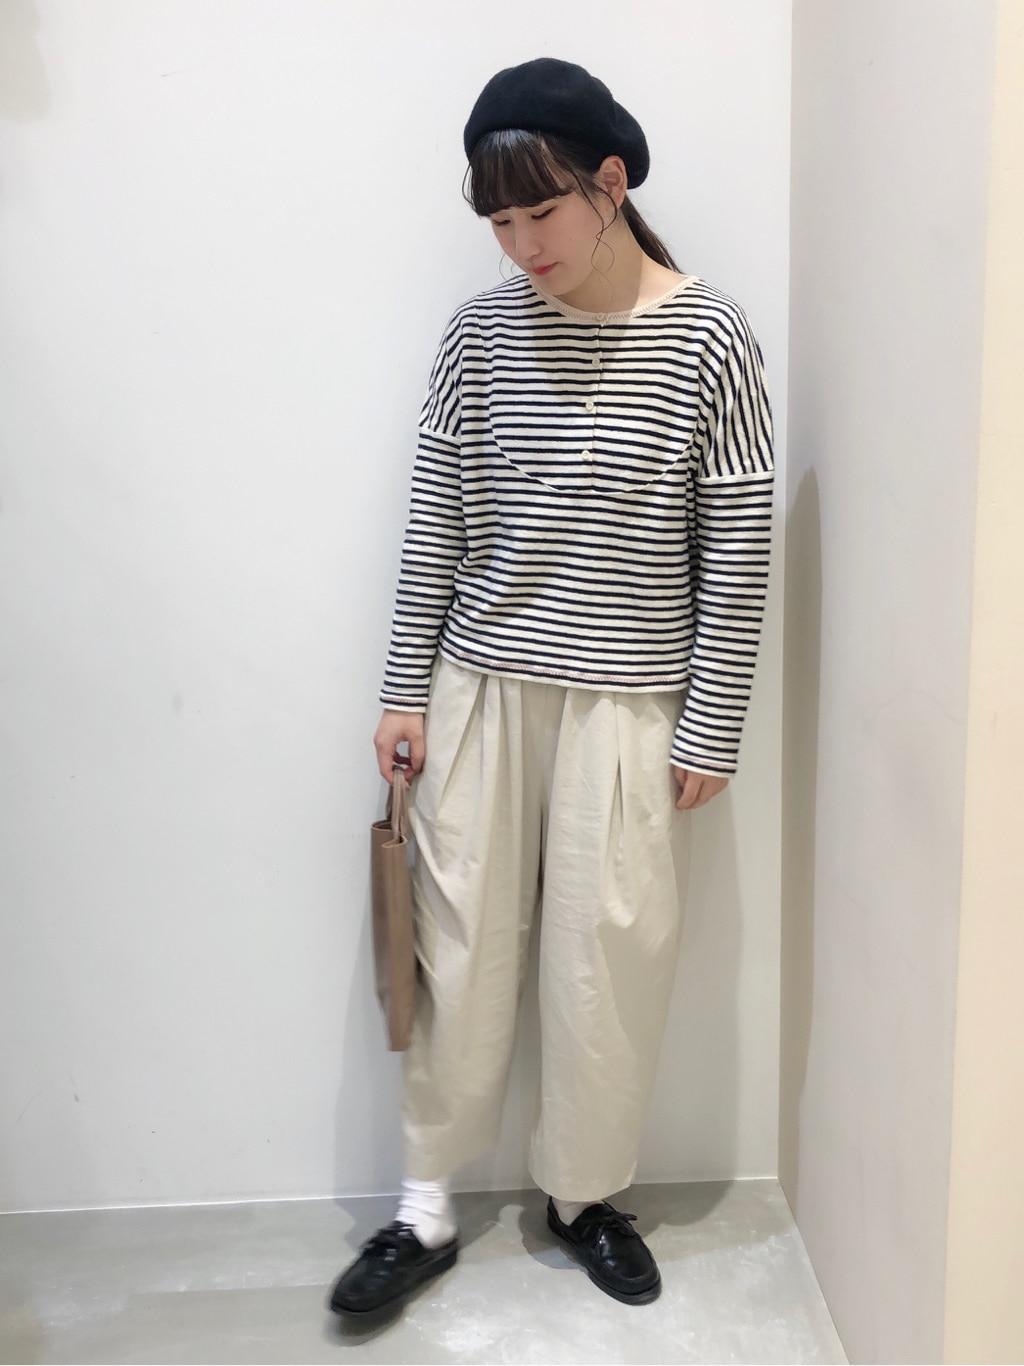 bulle de savon 阪急西宮ガーデンズ 身長:166cm 2020.01.26